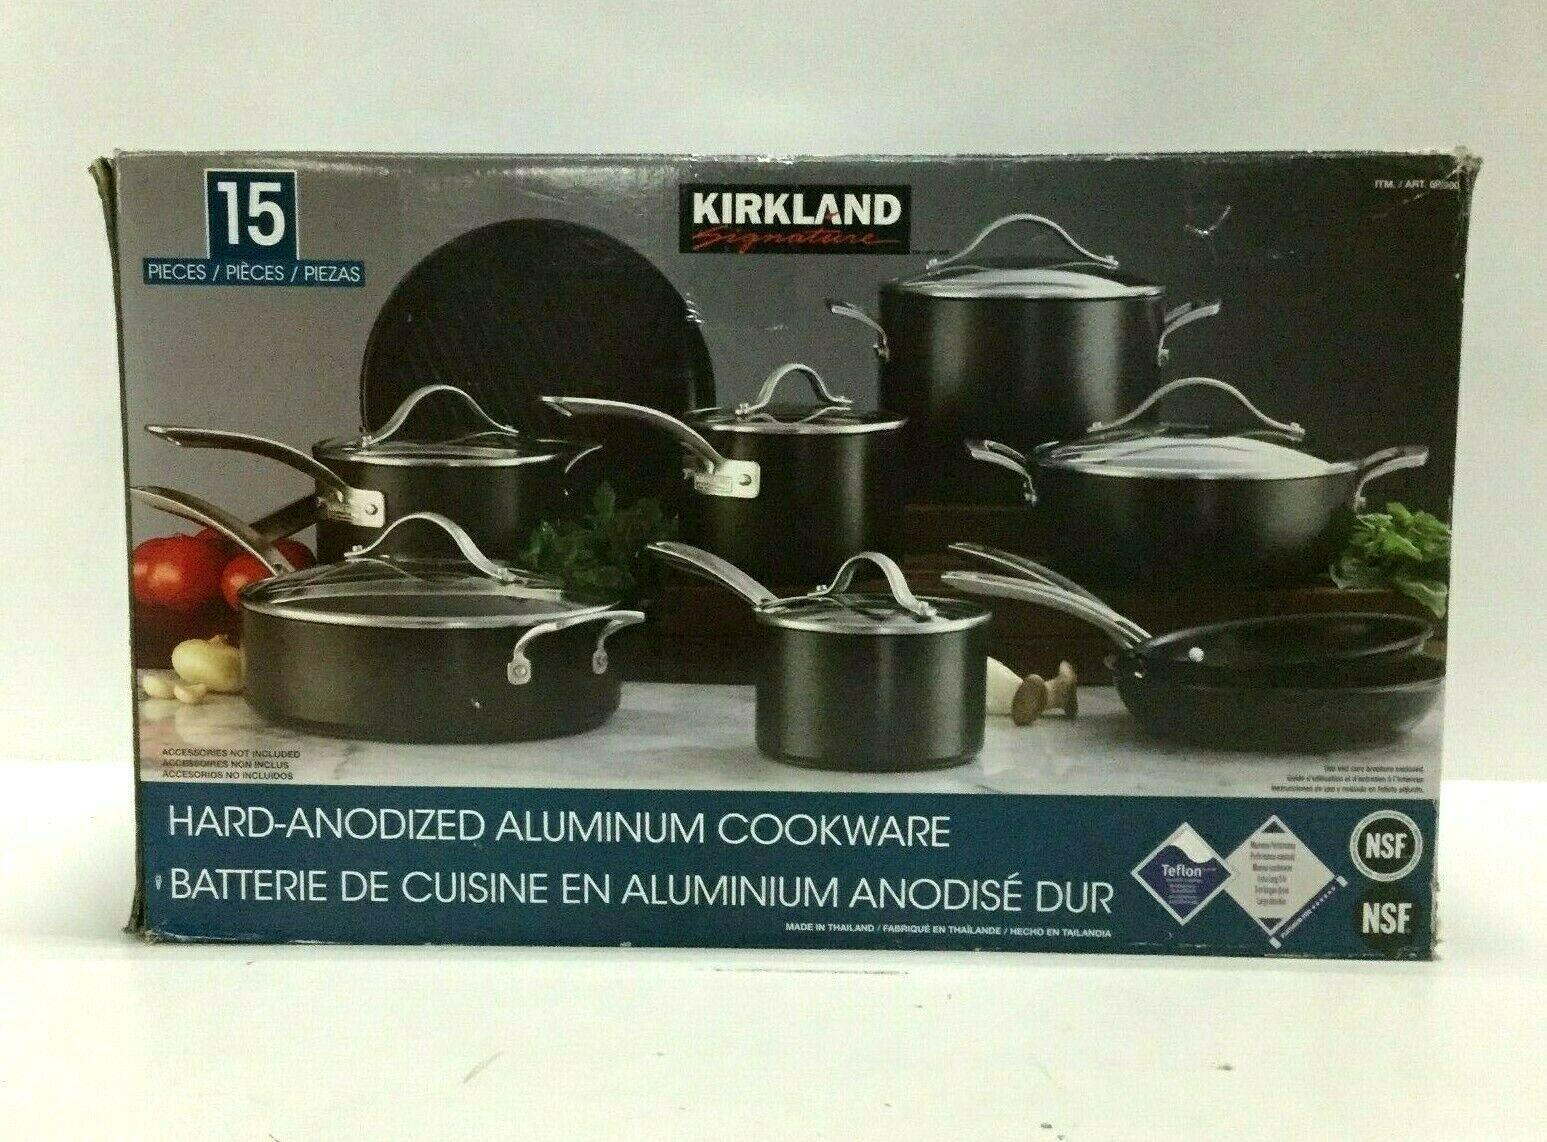 Kirkland Signature 15 Piece Hard Anodized Non Stick Aluminum